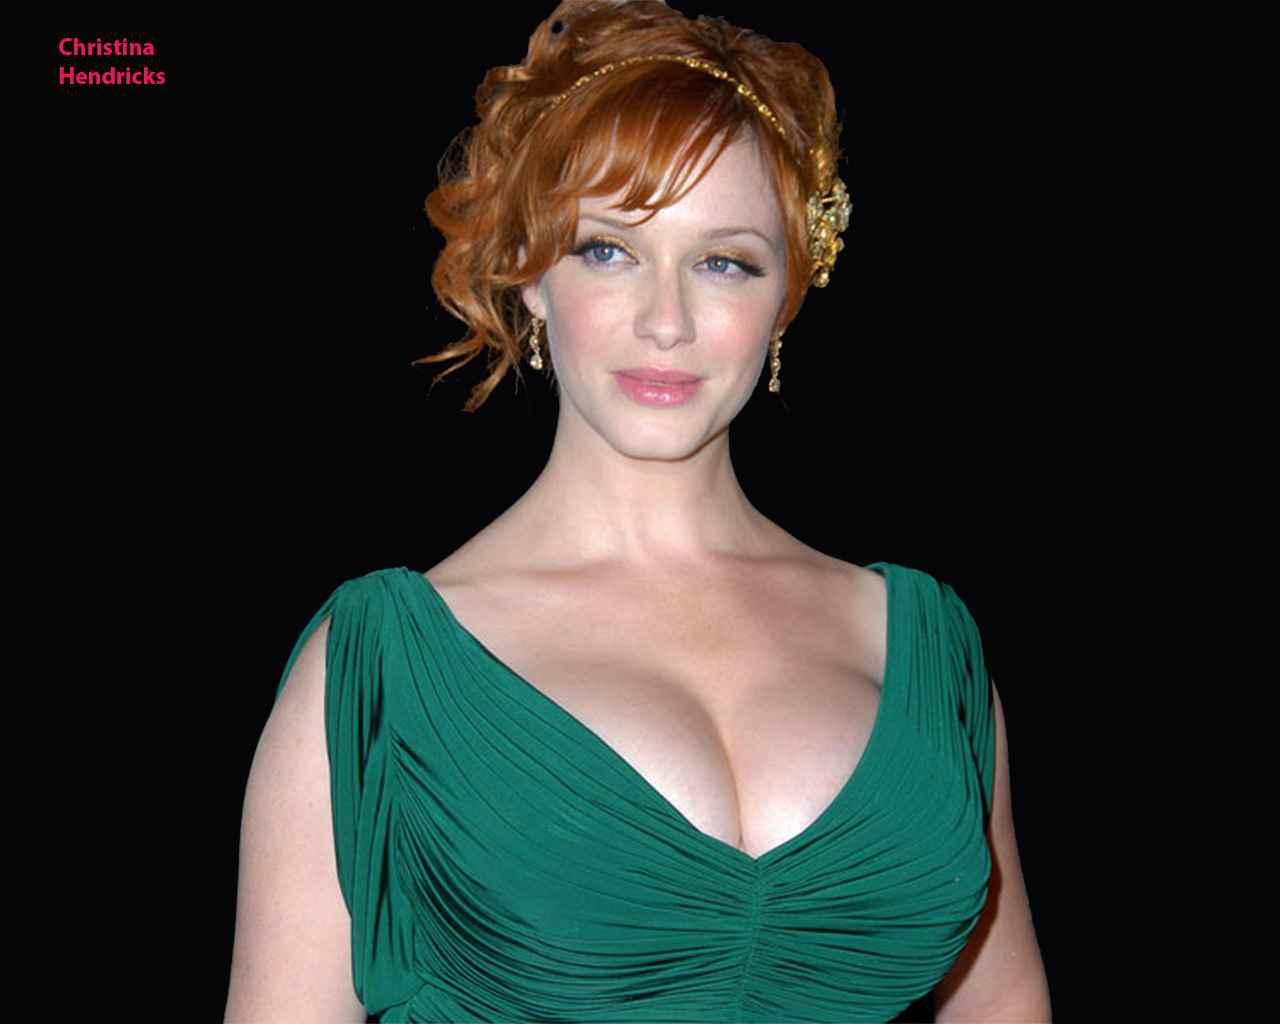 http://1.bp.blogspot.com/-bf35-Fy8ZFg/TjK7qwNdBMI/AAAAAAAALLs/mIA777_5h44/s1600/Actress-+Christina+-Hendricks-22.jpg